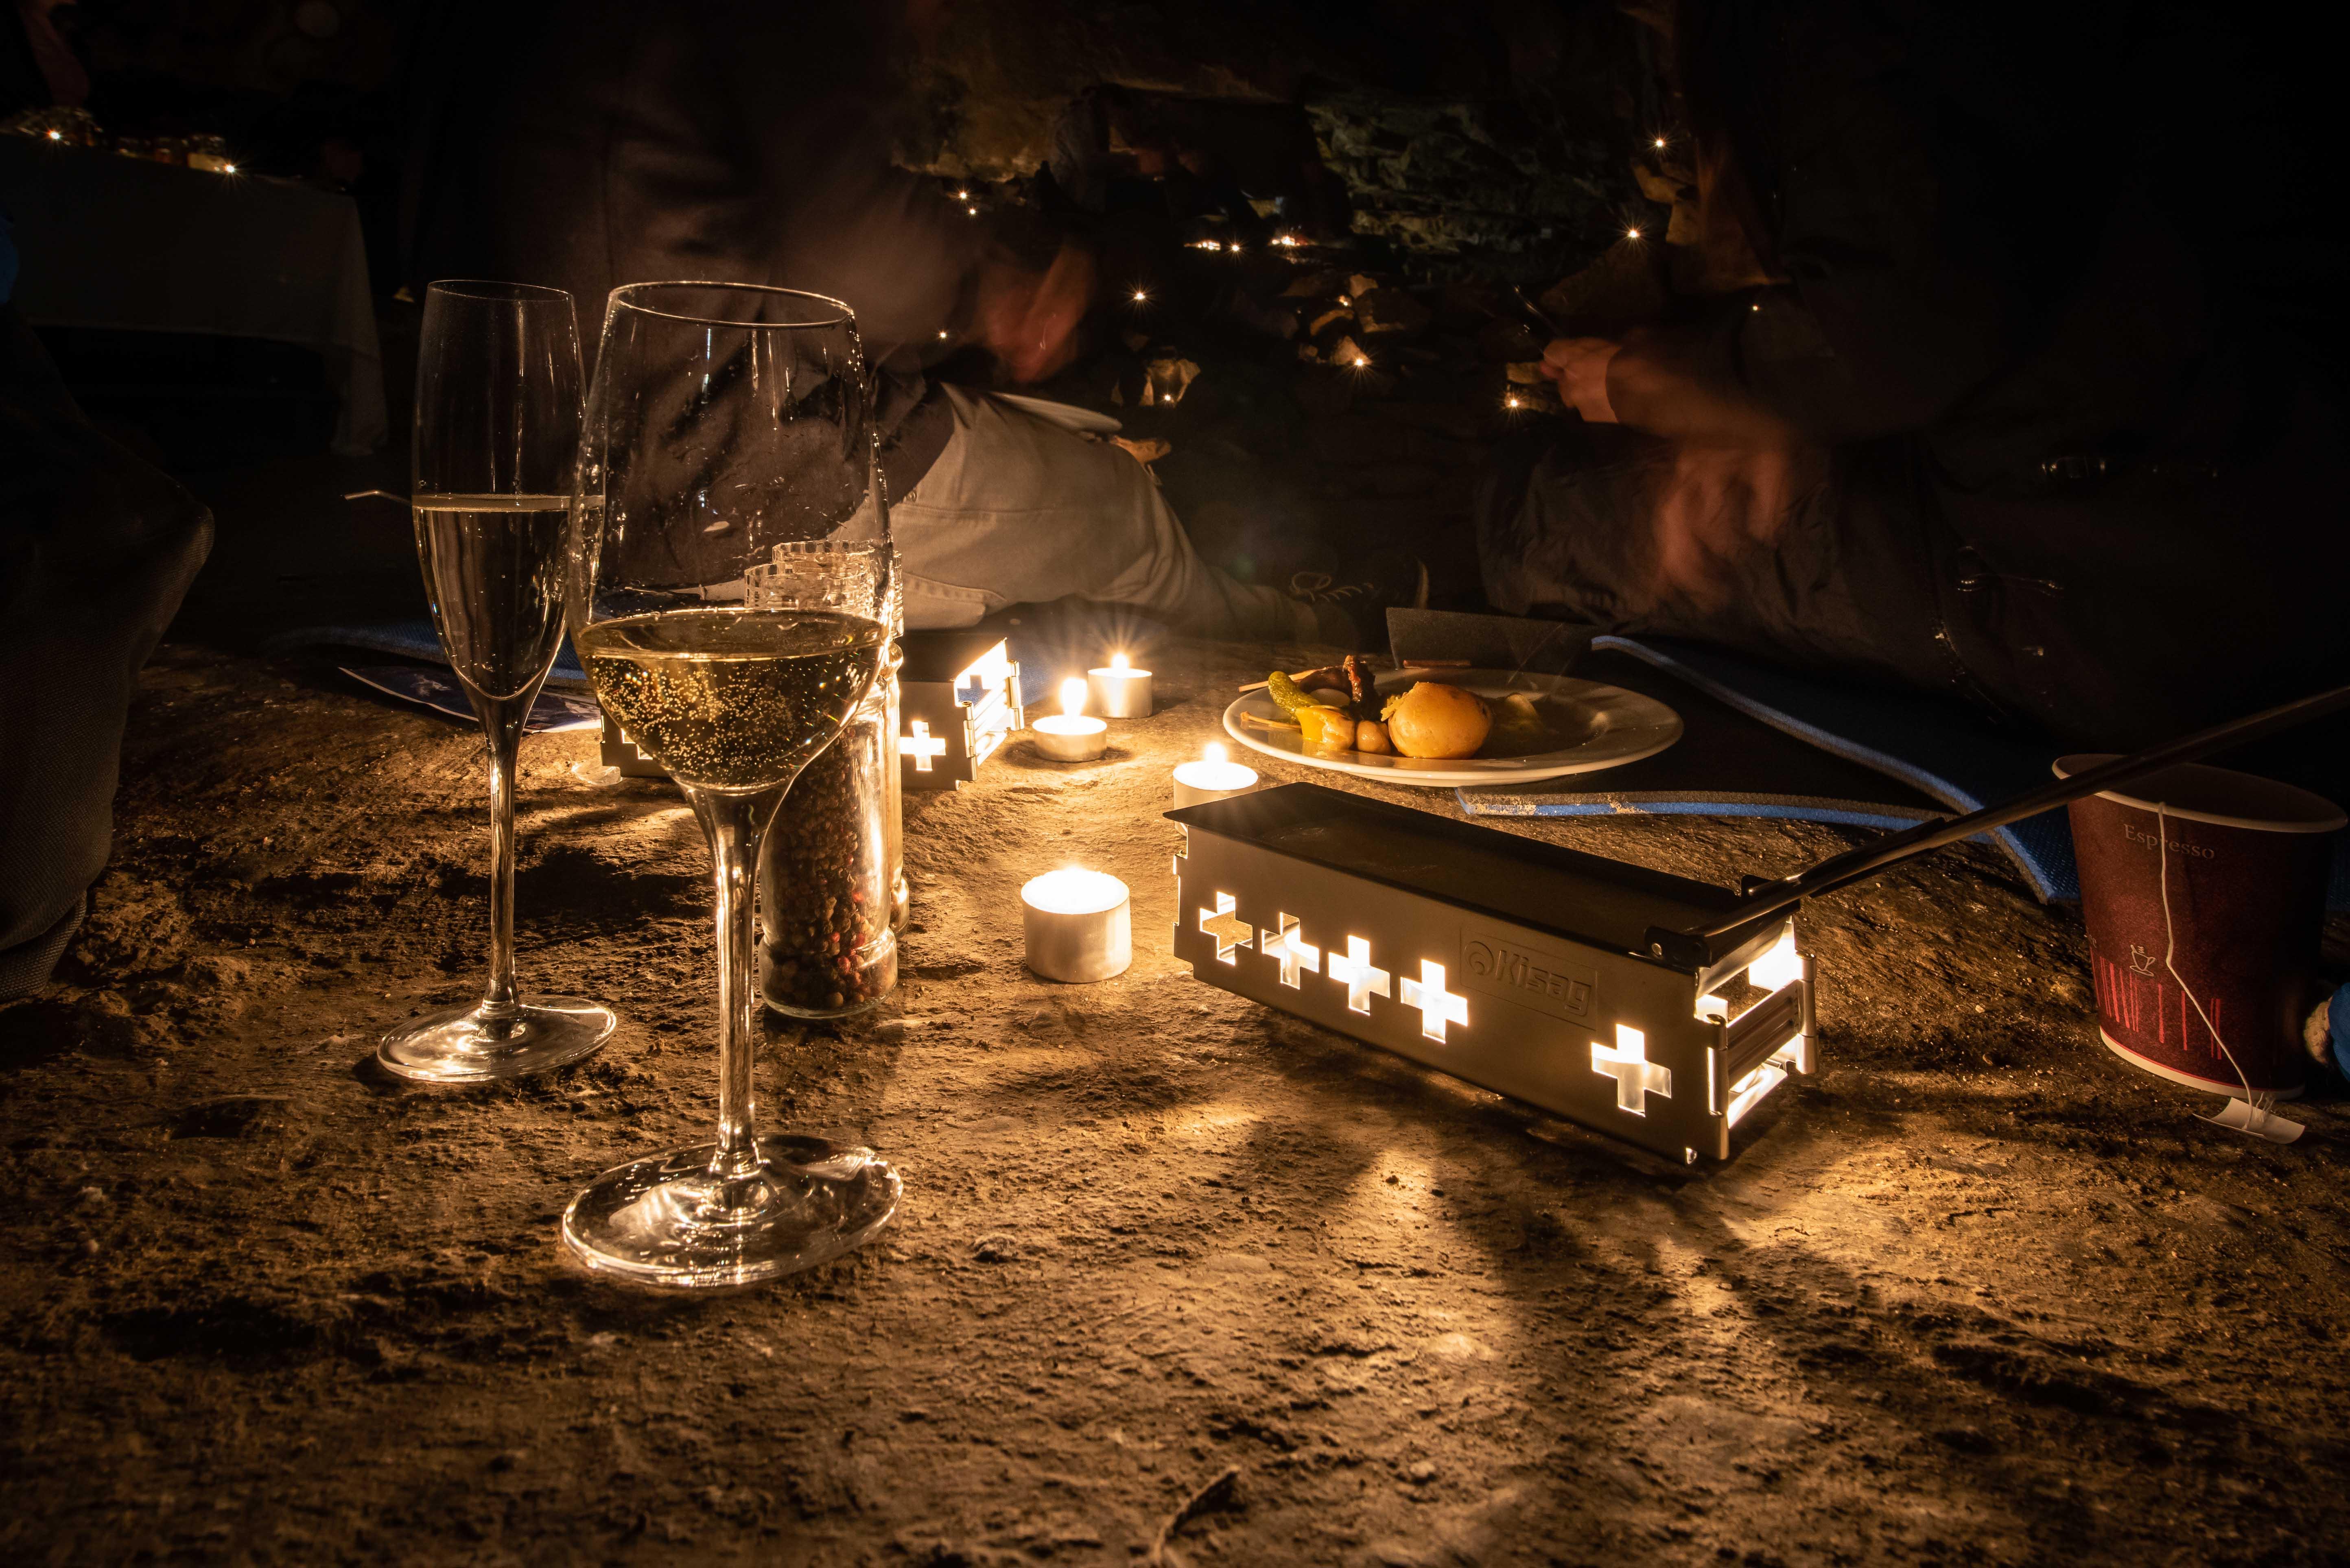 Exklusives Candle-light Höhlenraclette